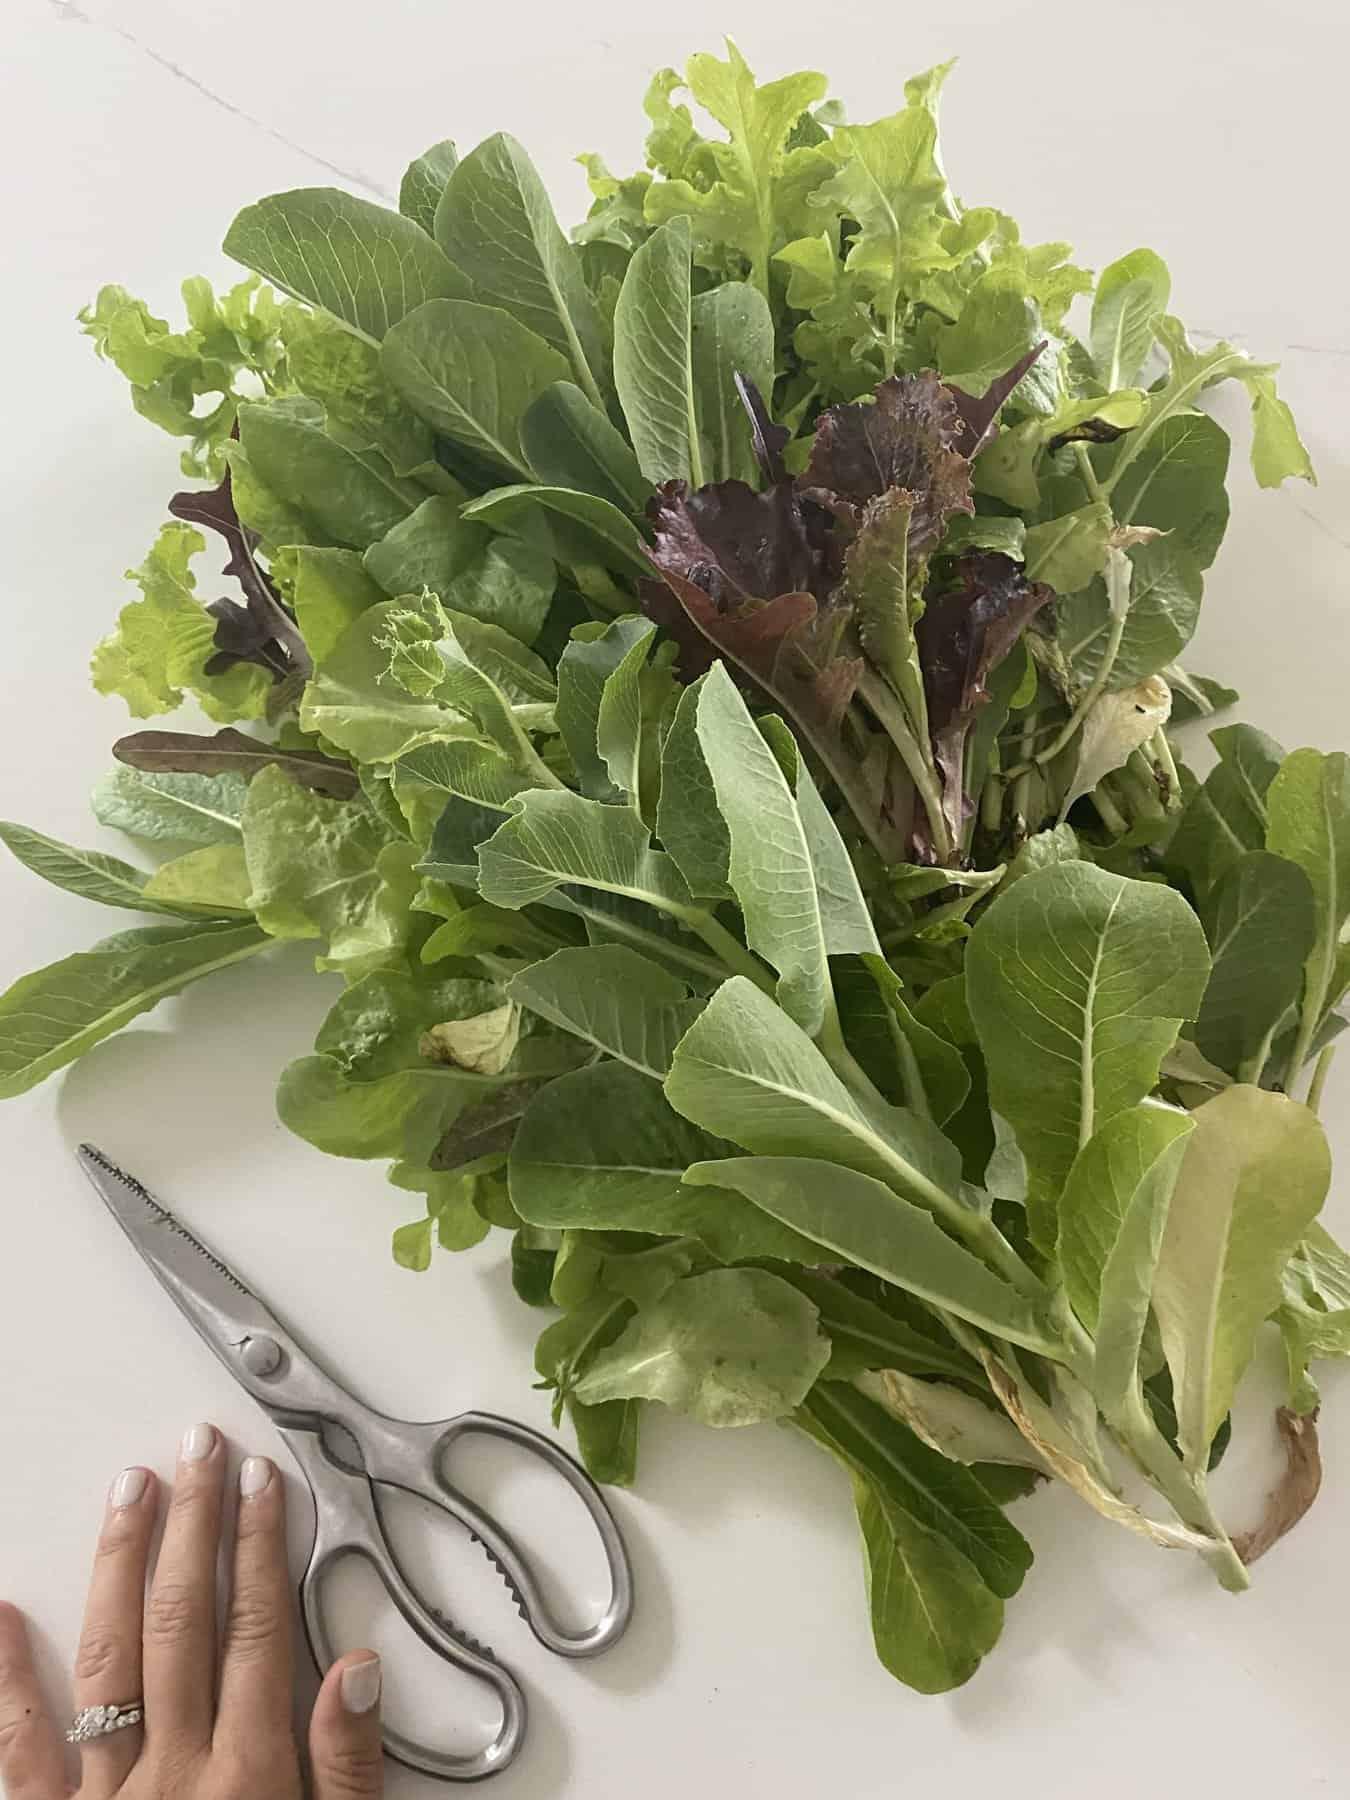 Garden Salad Greens Harvest